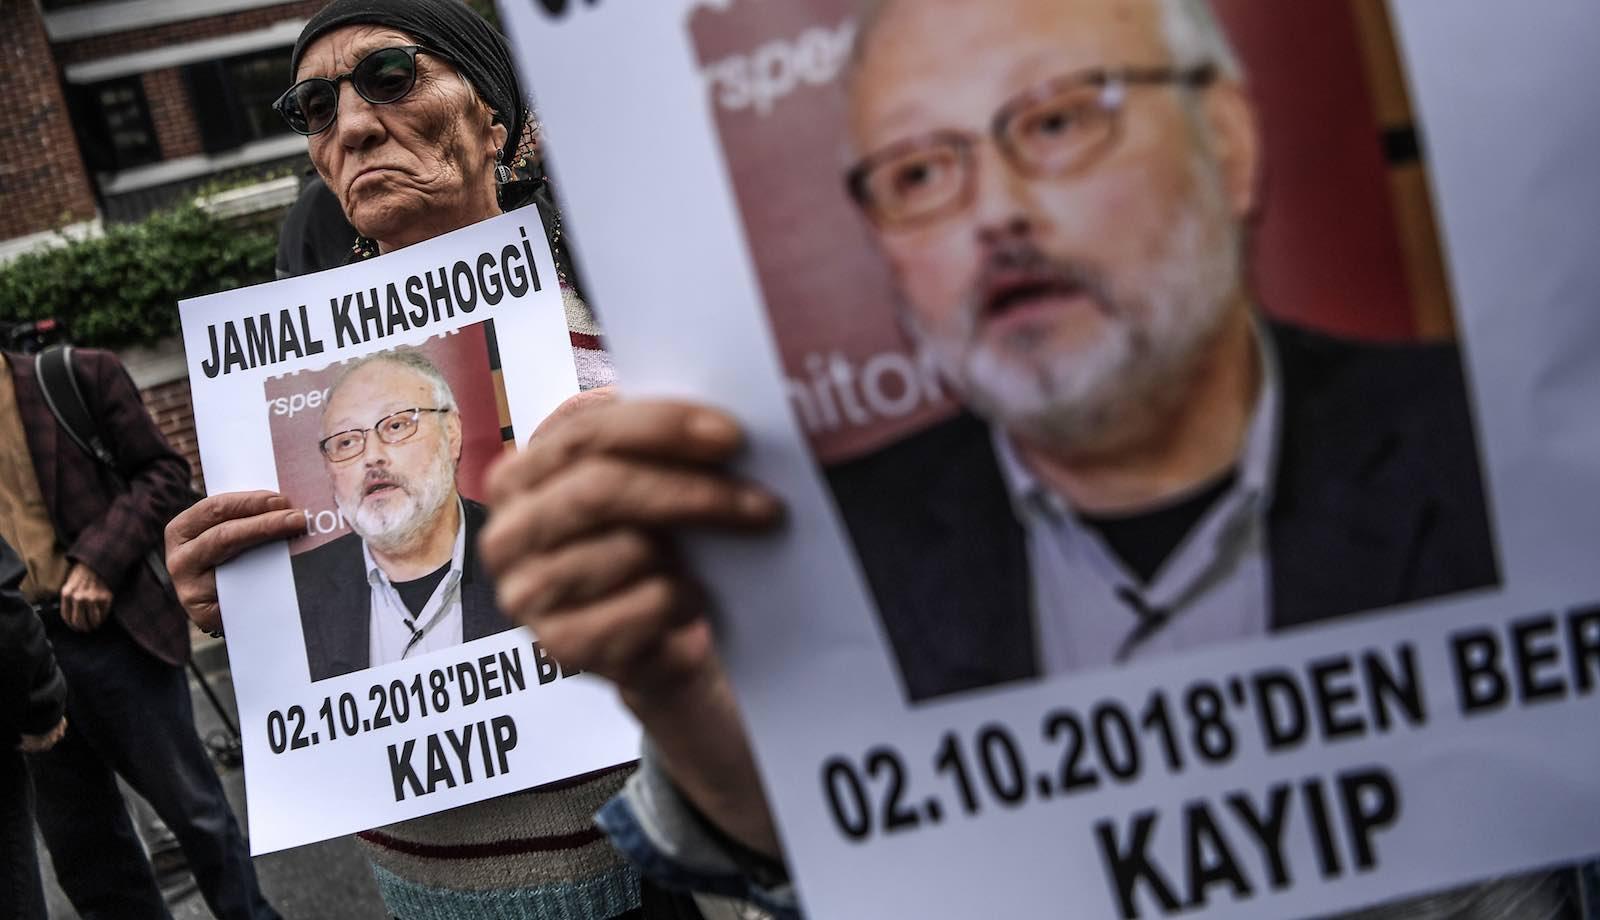 Demonstrators outside the Saudi consulate in Istanbul where journalist Jamal Khashoggi was last seen alive (Photo: Ozan Kose via Getty)